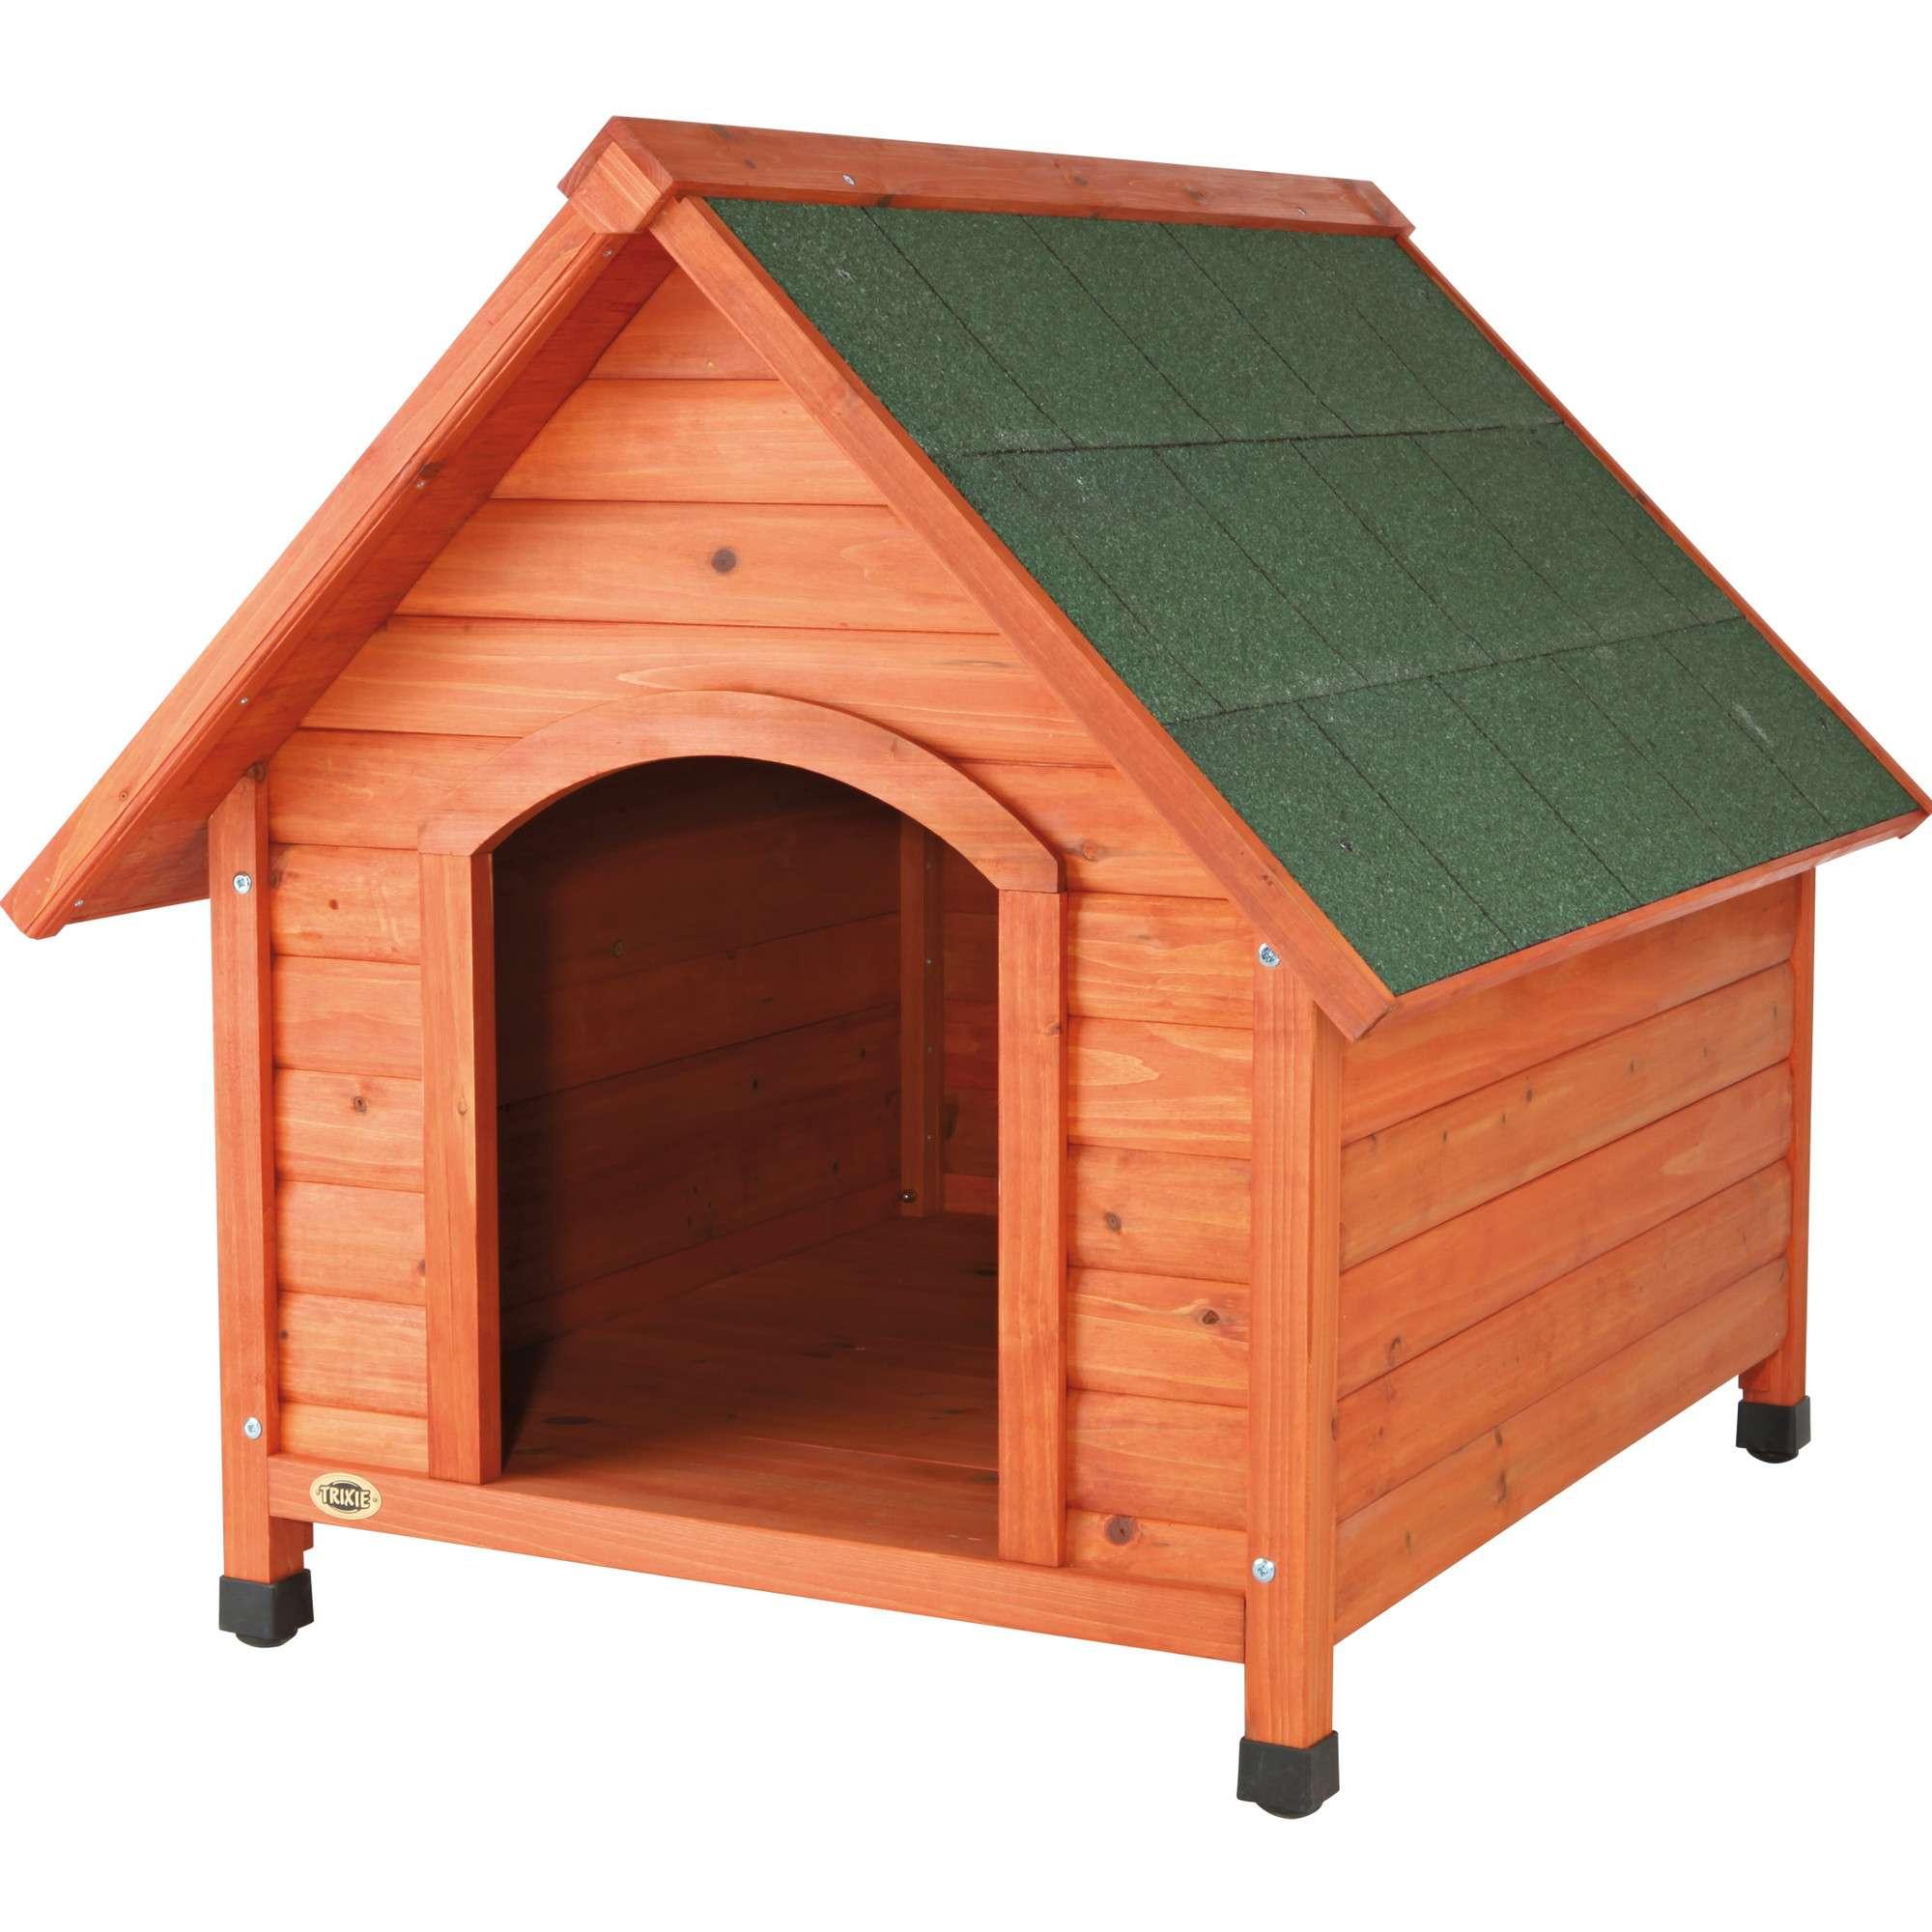 Casa para perros mascotas uso en exterior vv4 3 - Casa de mascotas ...